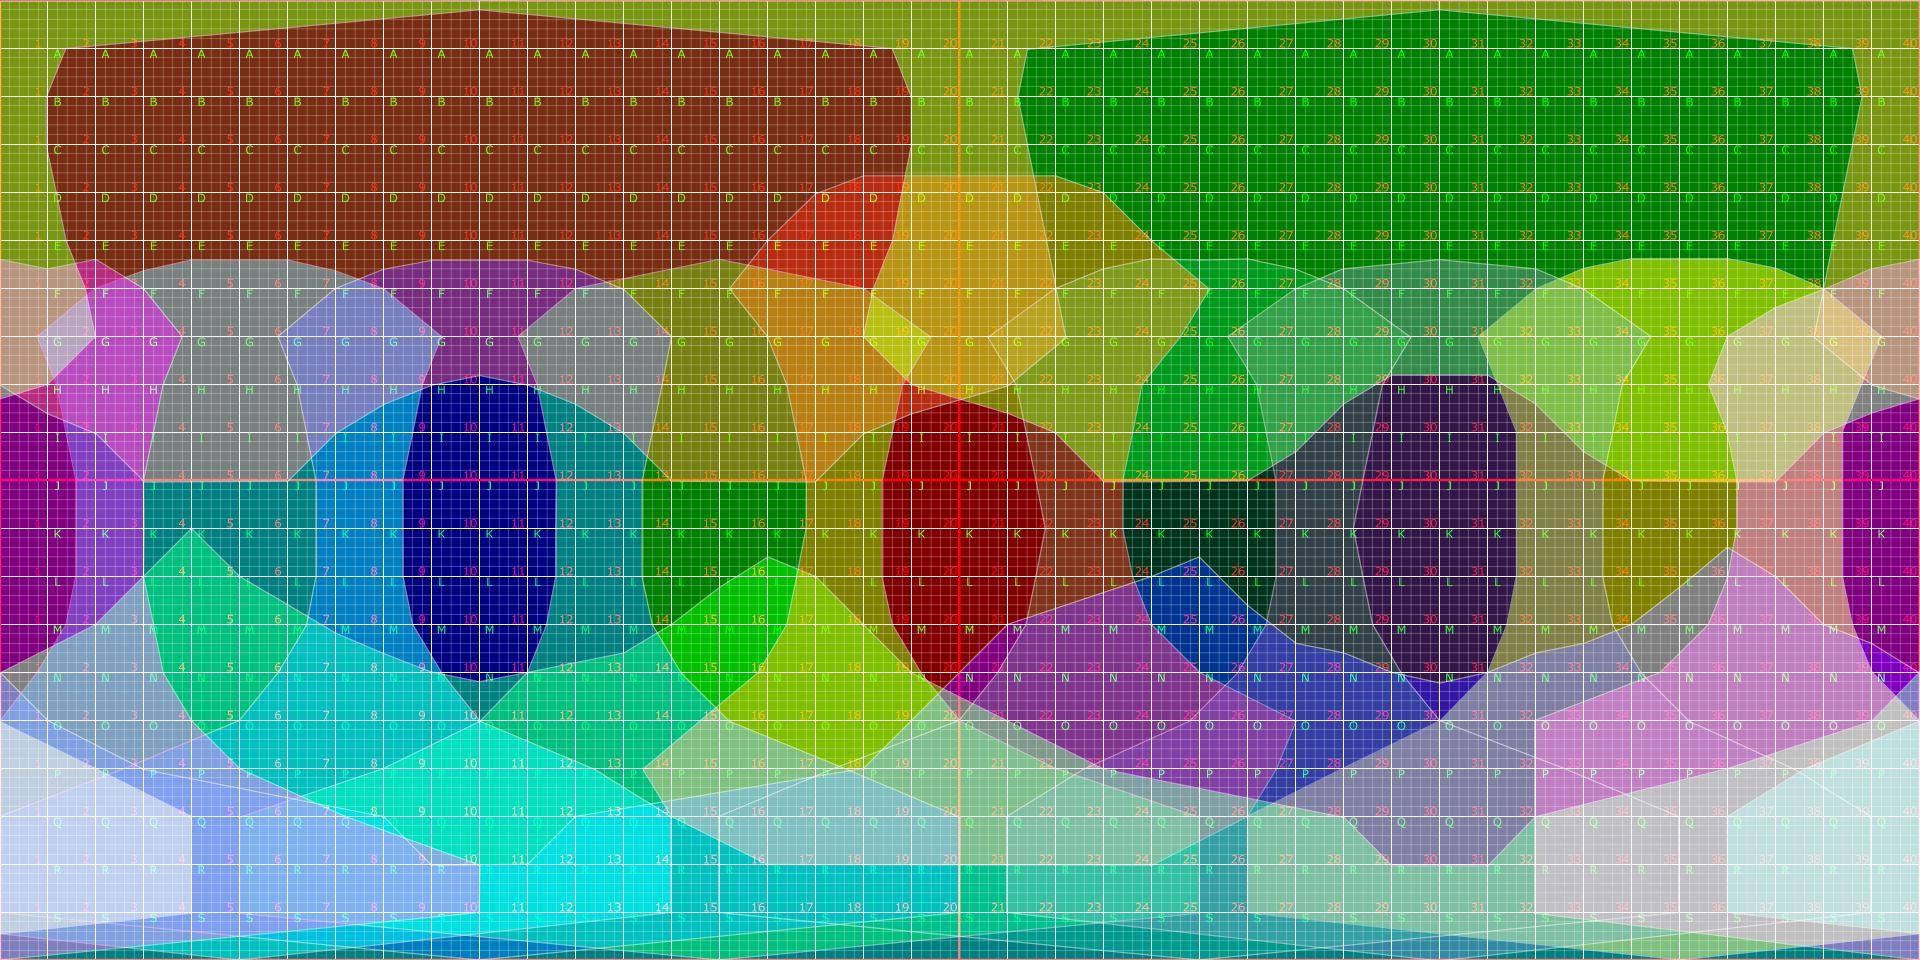 151117_testgrid-softedgebereiche-8k-x-4k-2_1920_0.jpg